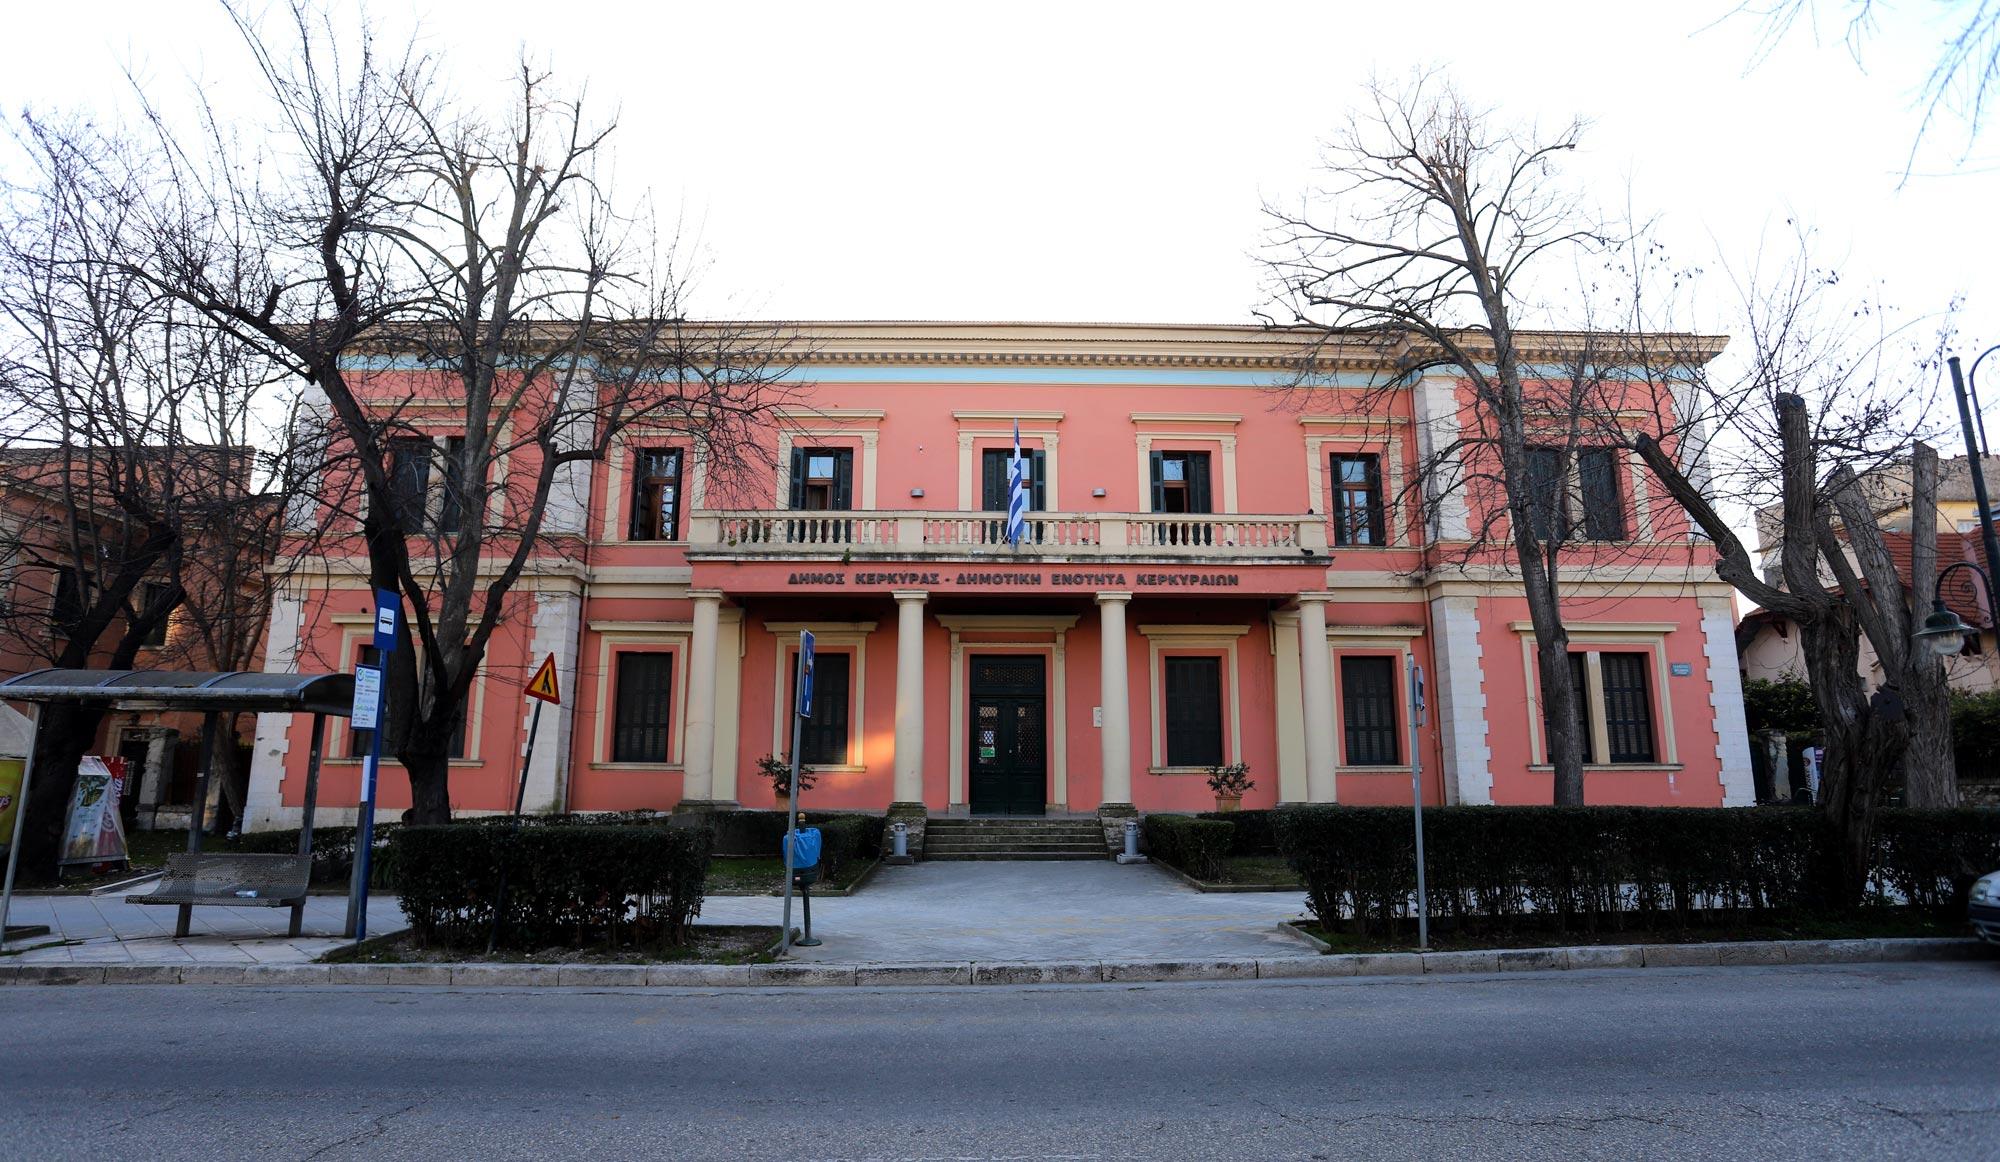 corfu.gr-2021-03-11_10-35-29_081778